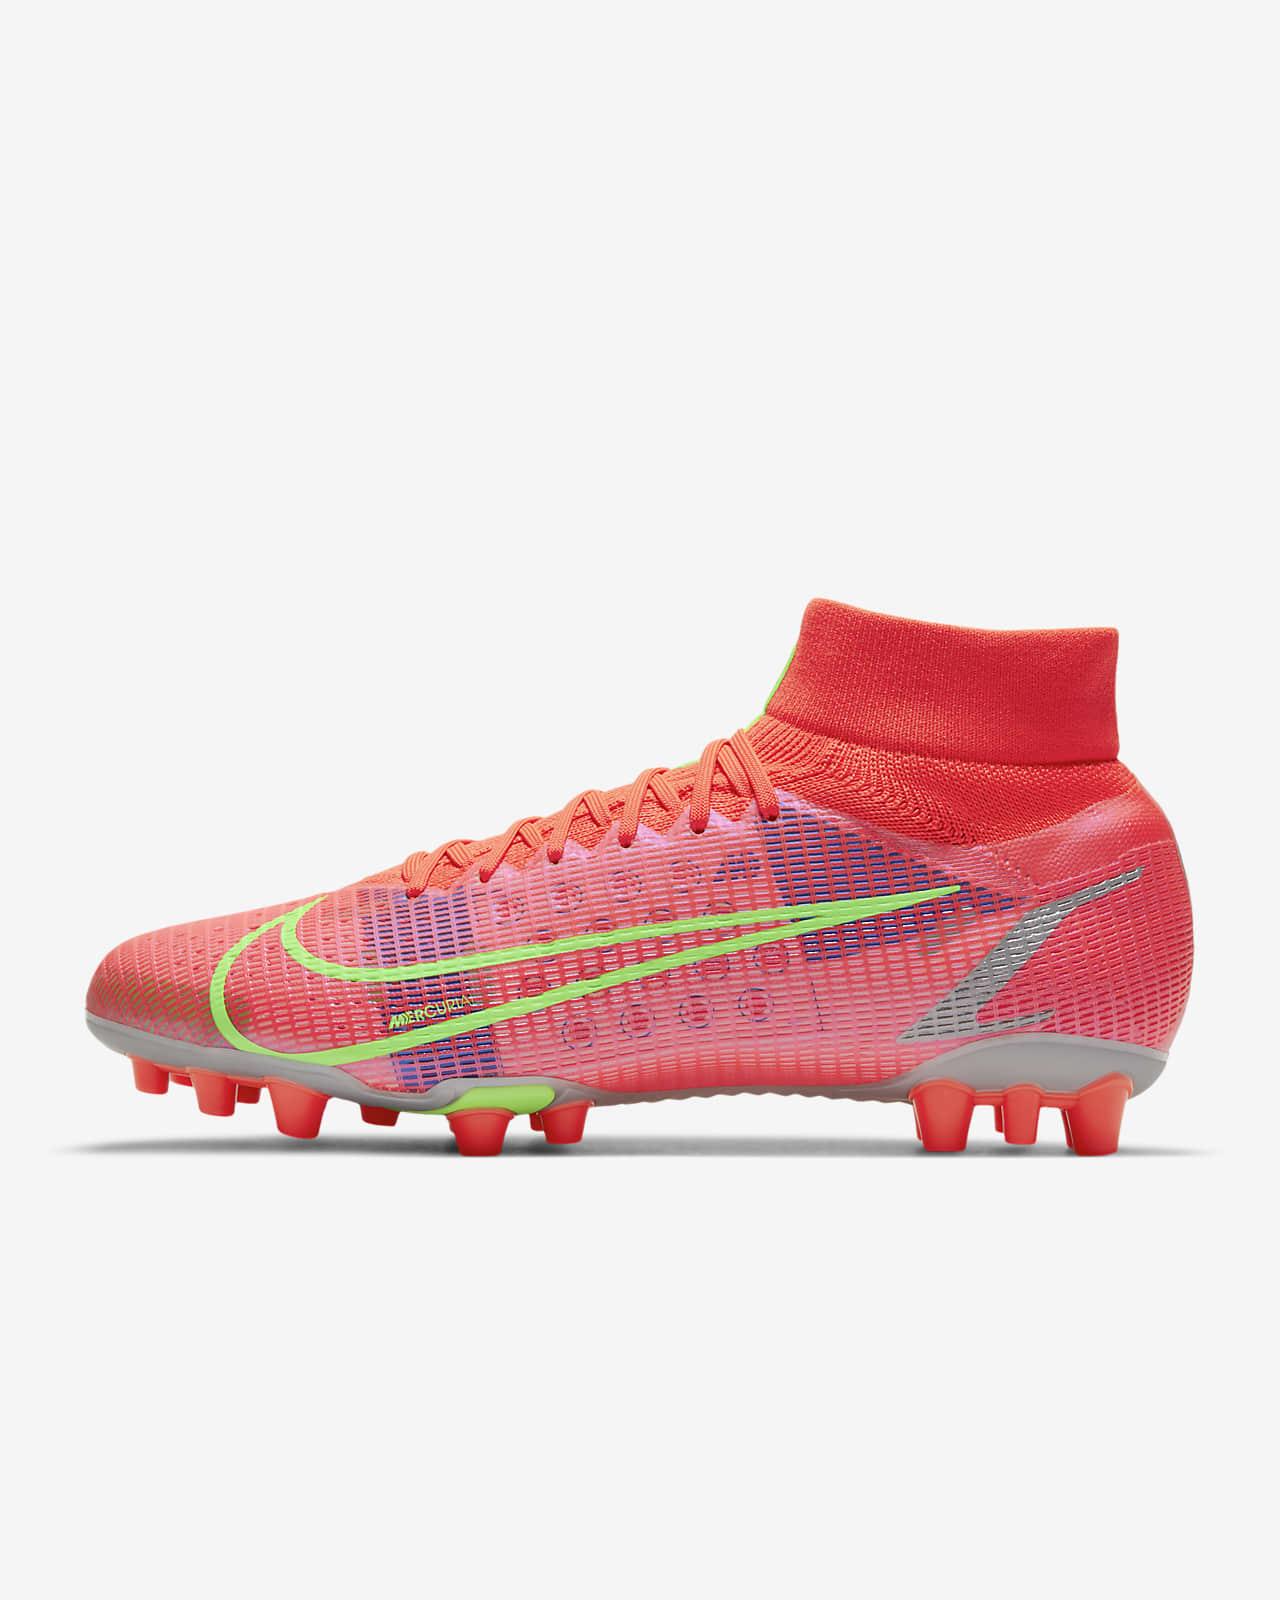 Nike Mercurial Superfly 8 Pro AG Fußballschuh für Kunstrasen